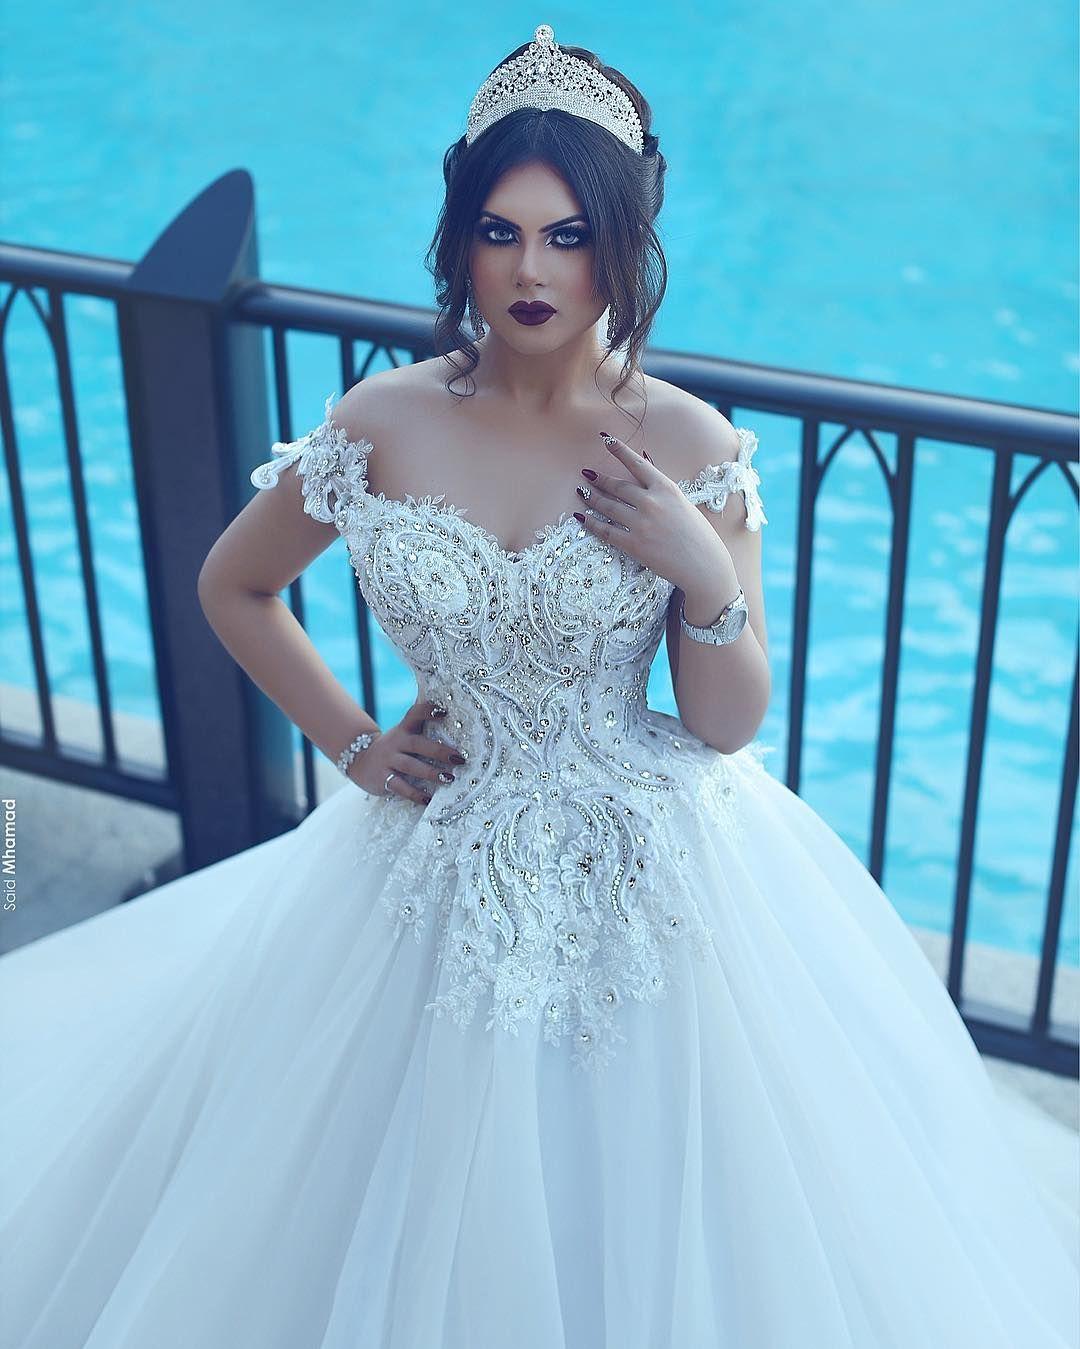 Pin by mun on Jewels & Crowns | Pinterest | Wedding dress, Wedding ...